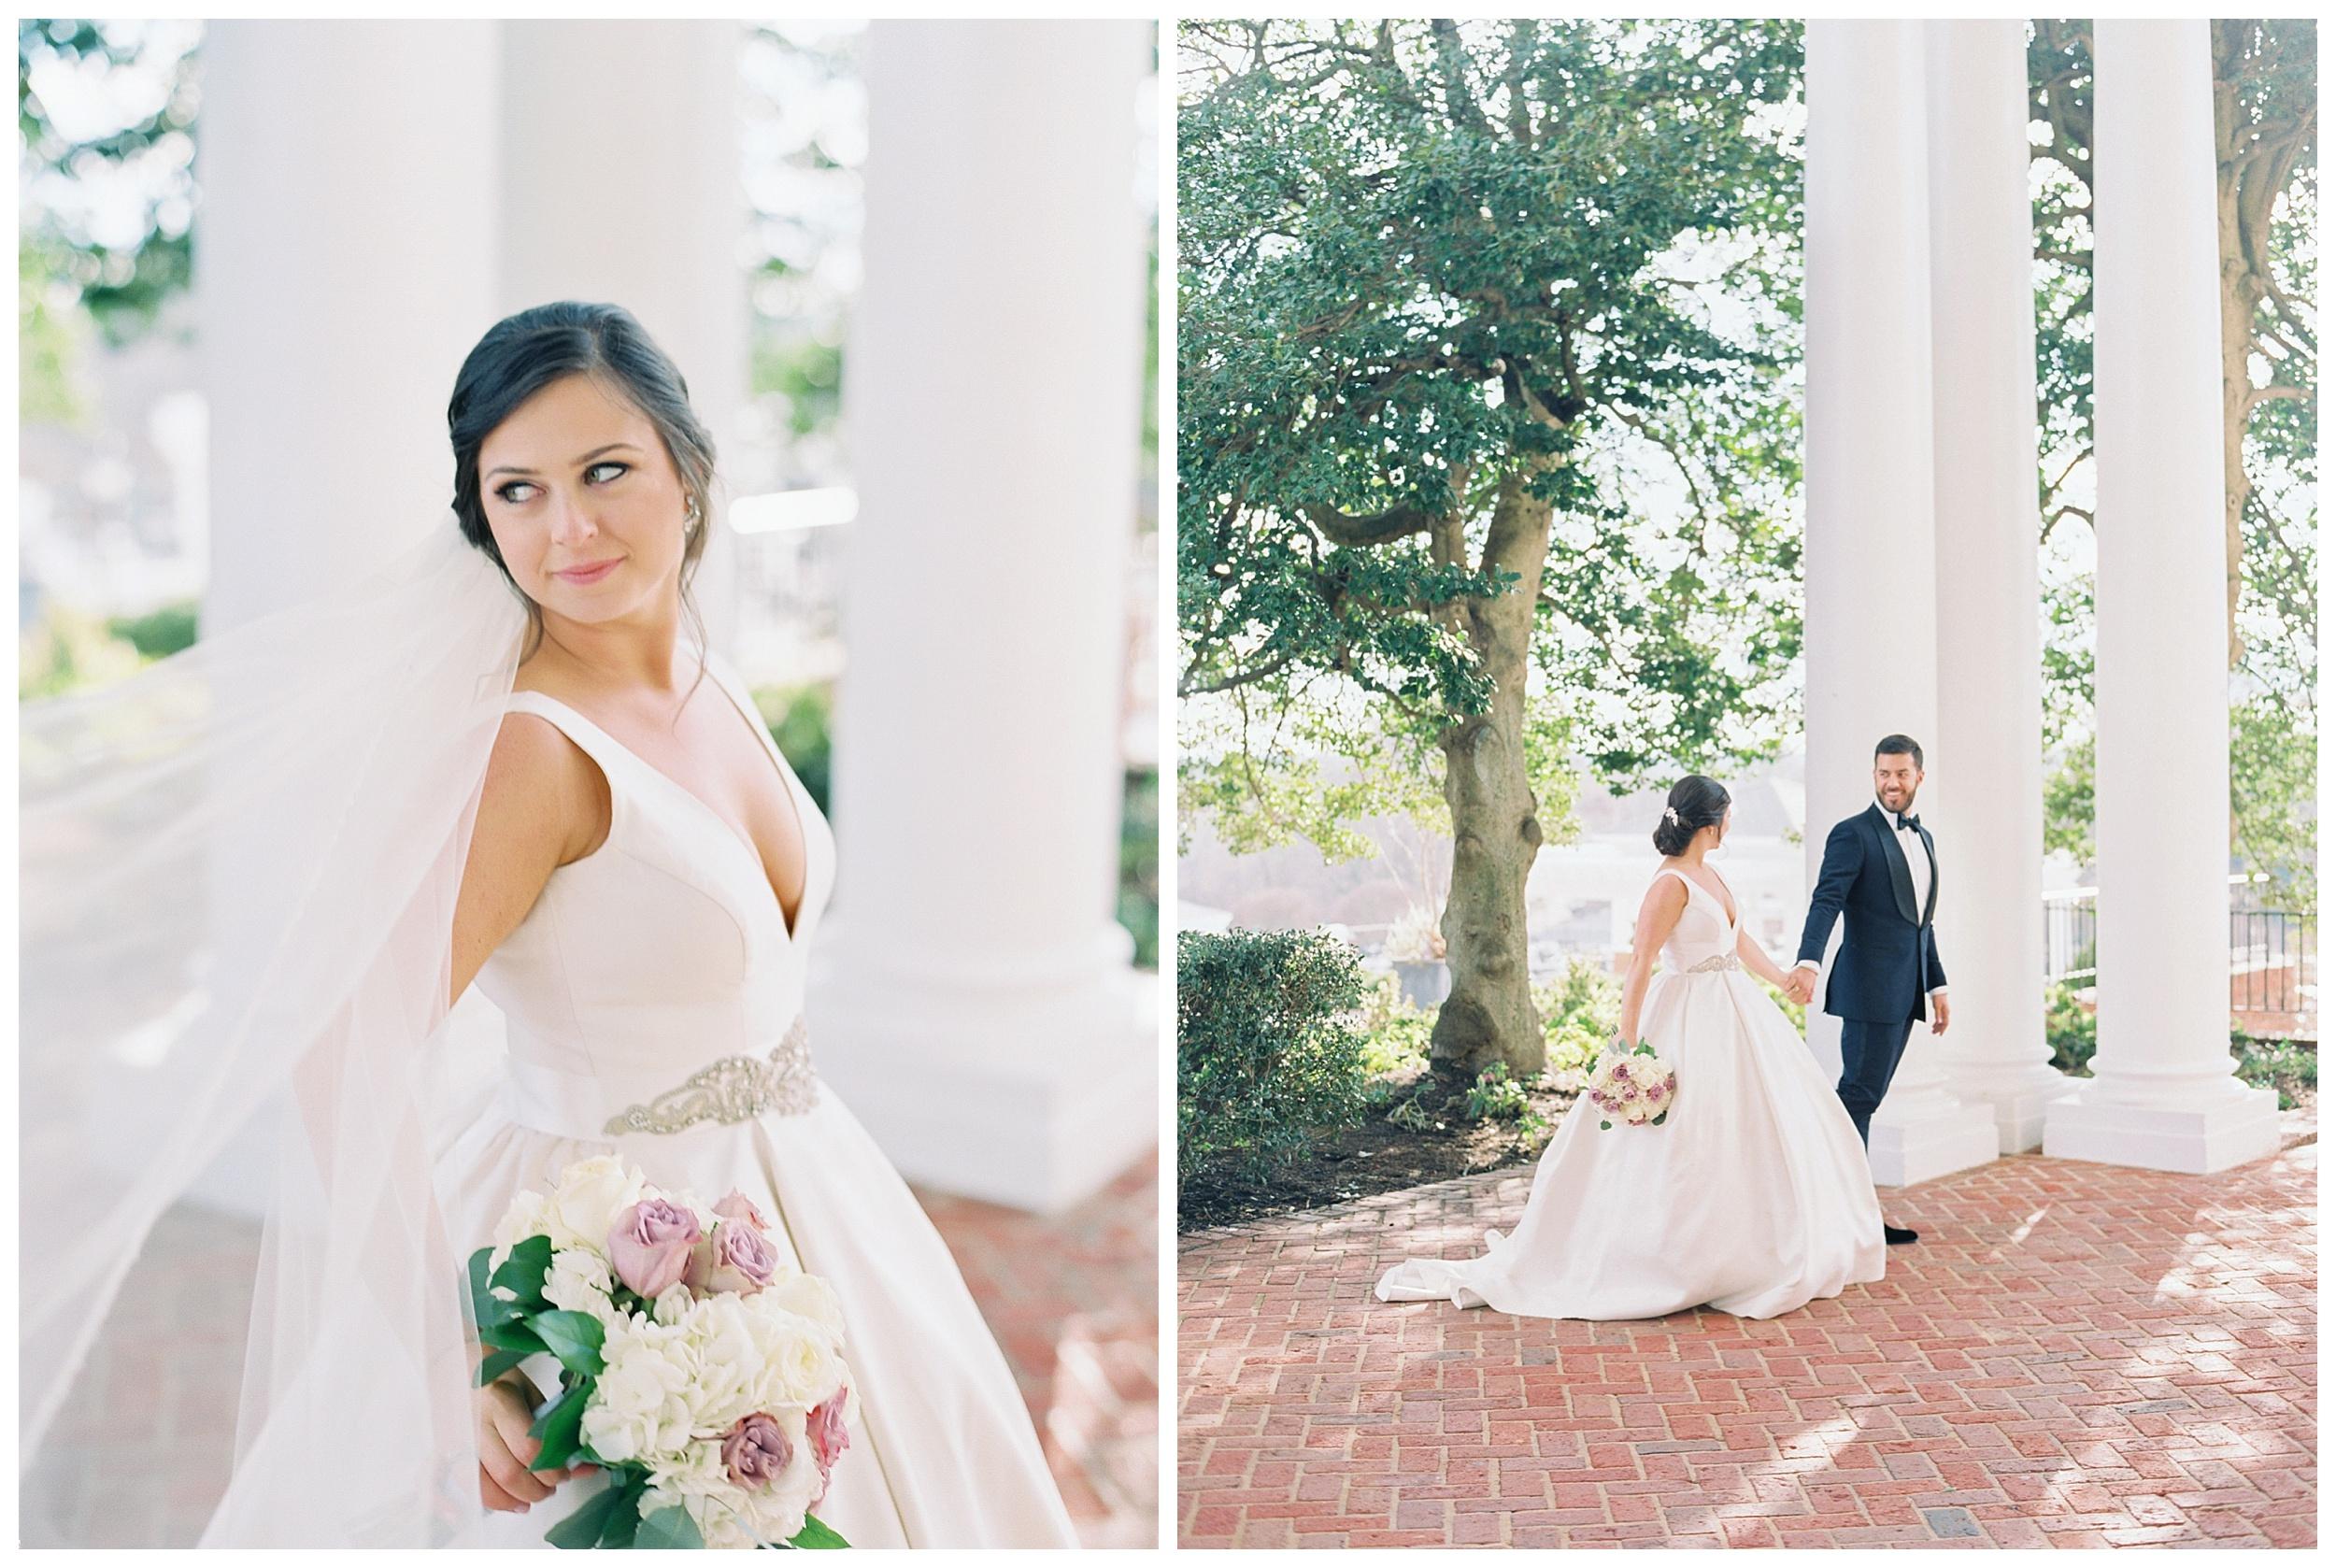 Country Club of Virginia Wedding | Richmond Wedding Photographer_0092.jpg